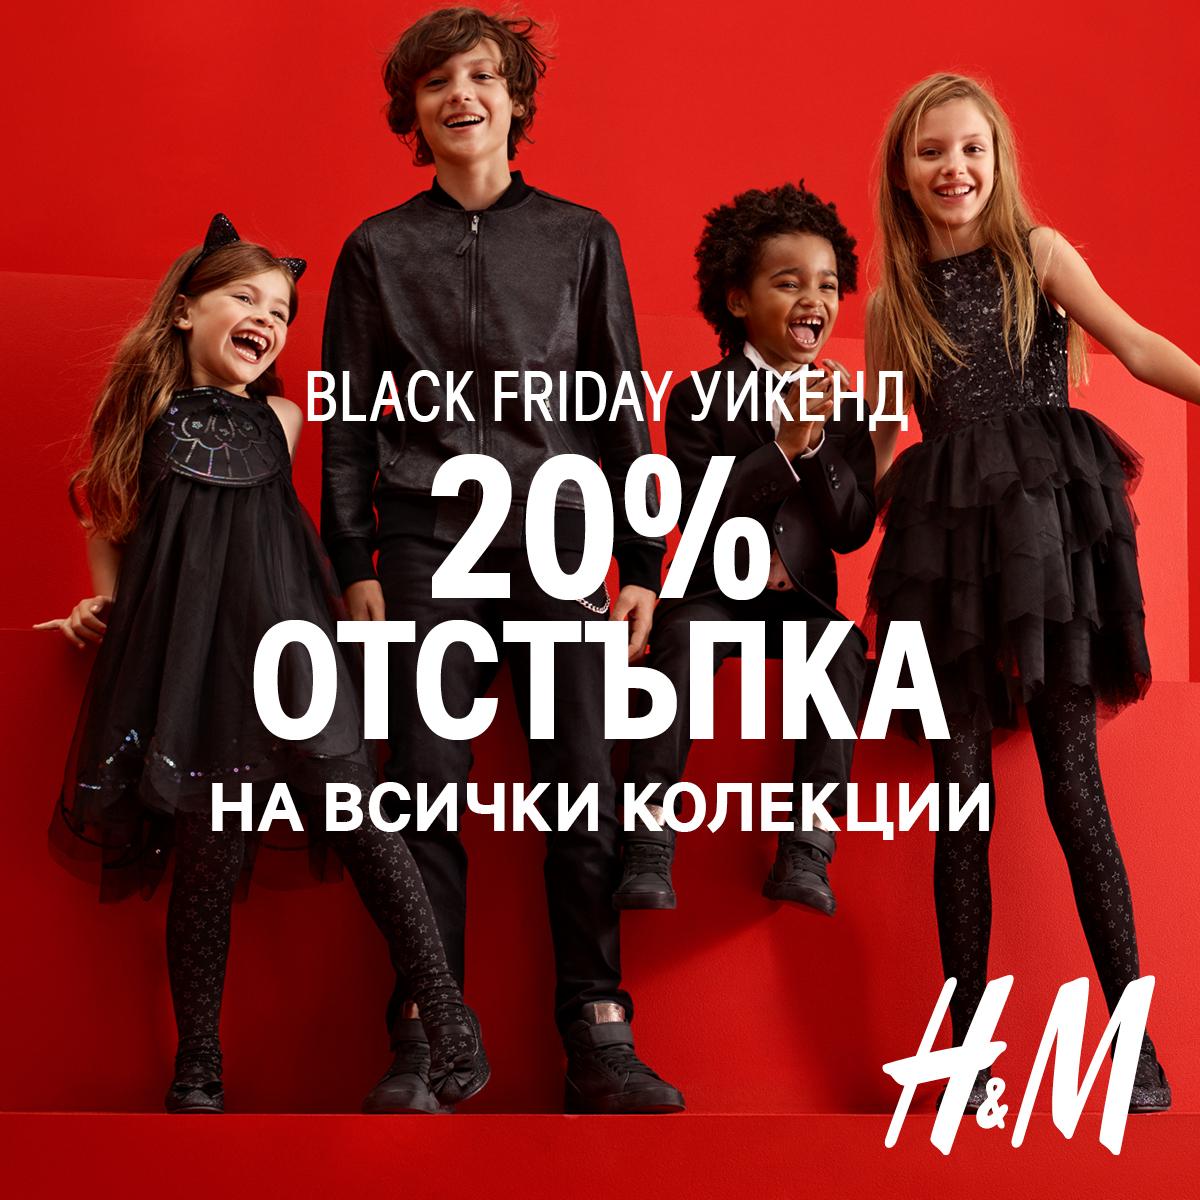 Black Friday УИКЕНД в H&M